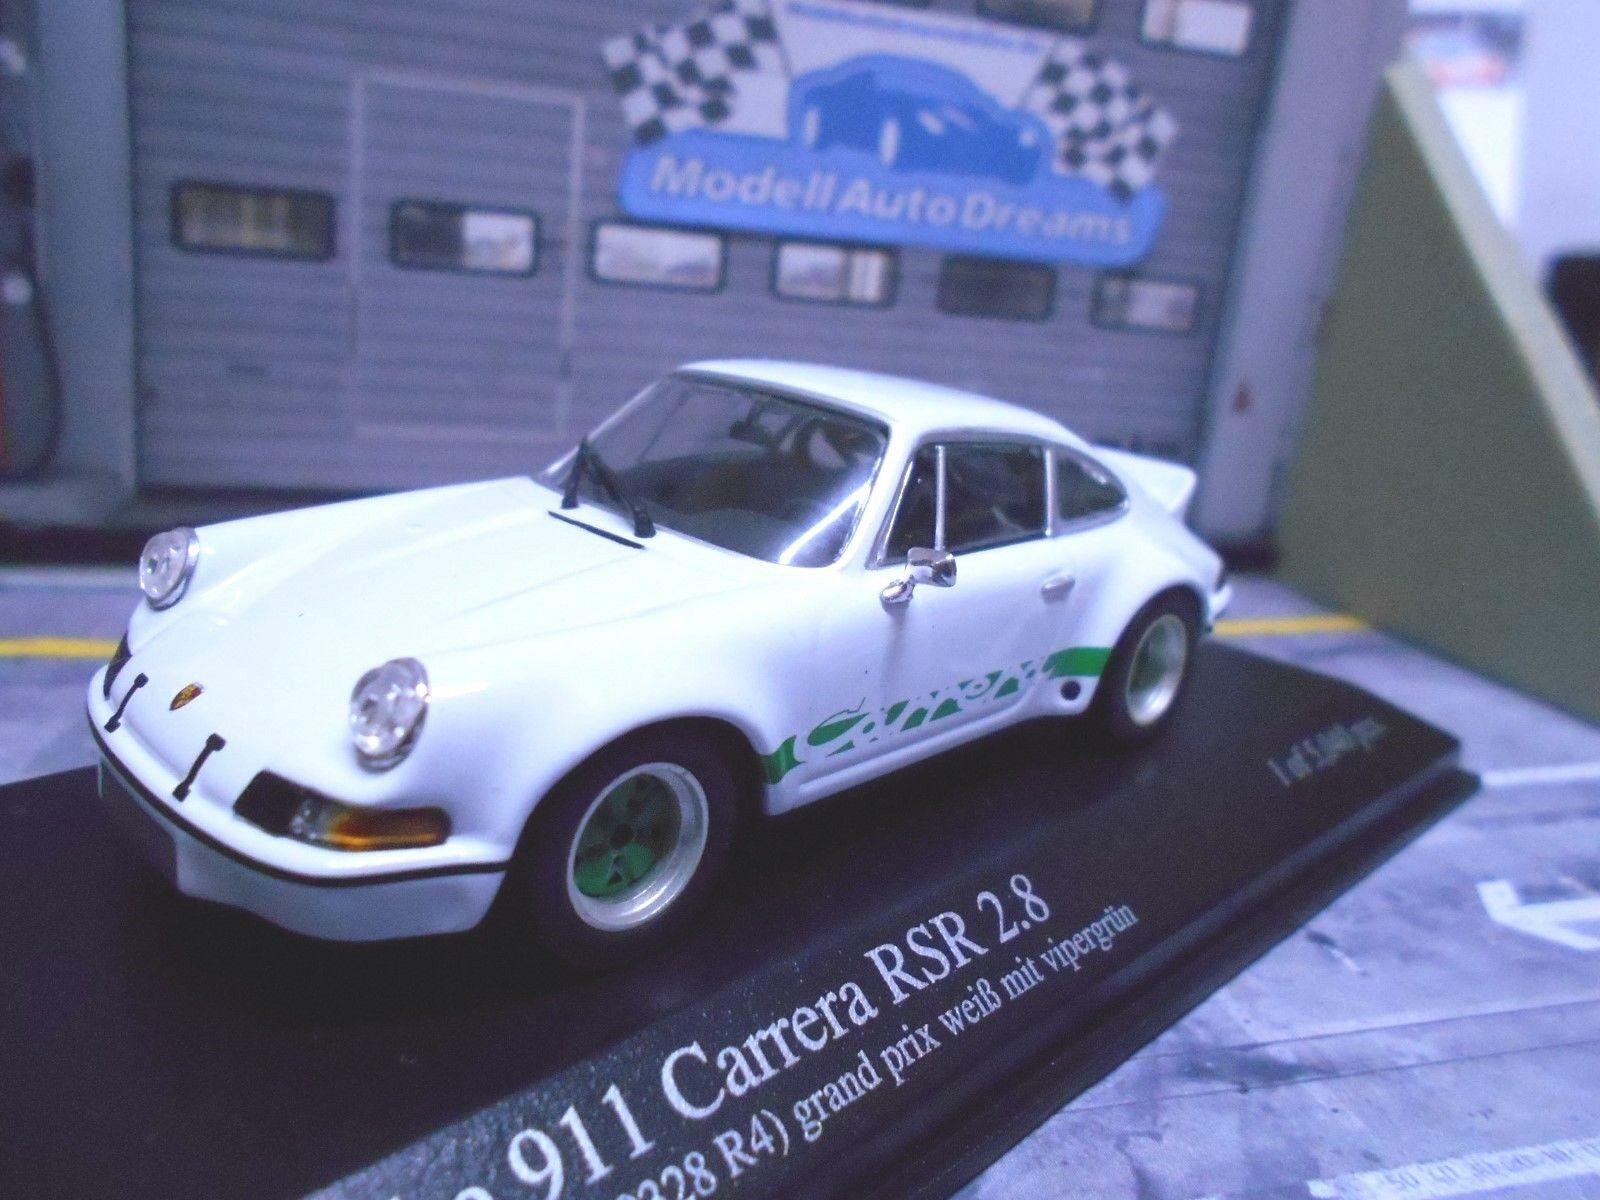 PORSCHE 911 Carrera RSR 2.8 F modello bianca  BIANCO VERDE 1973 Minichamps RAR 1:43